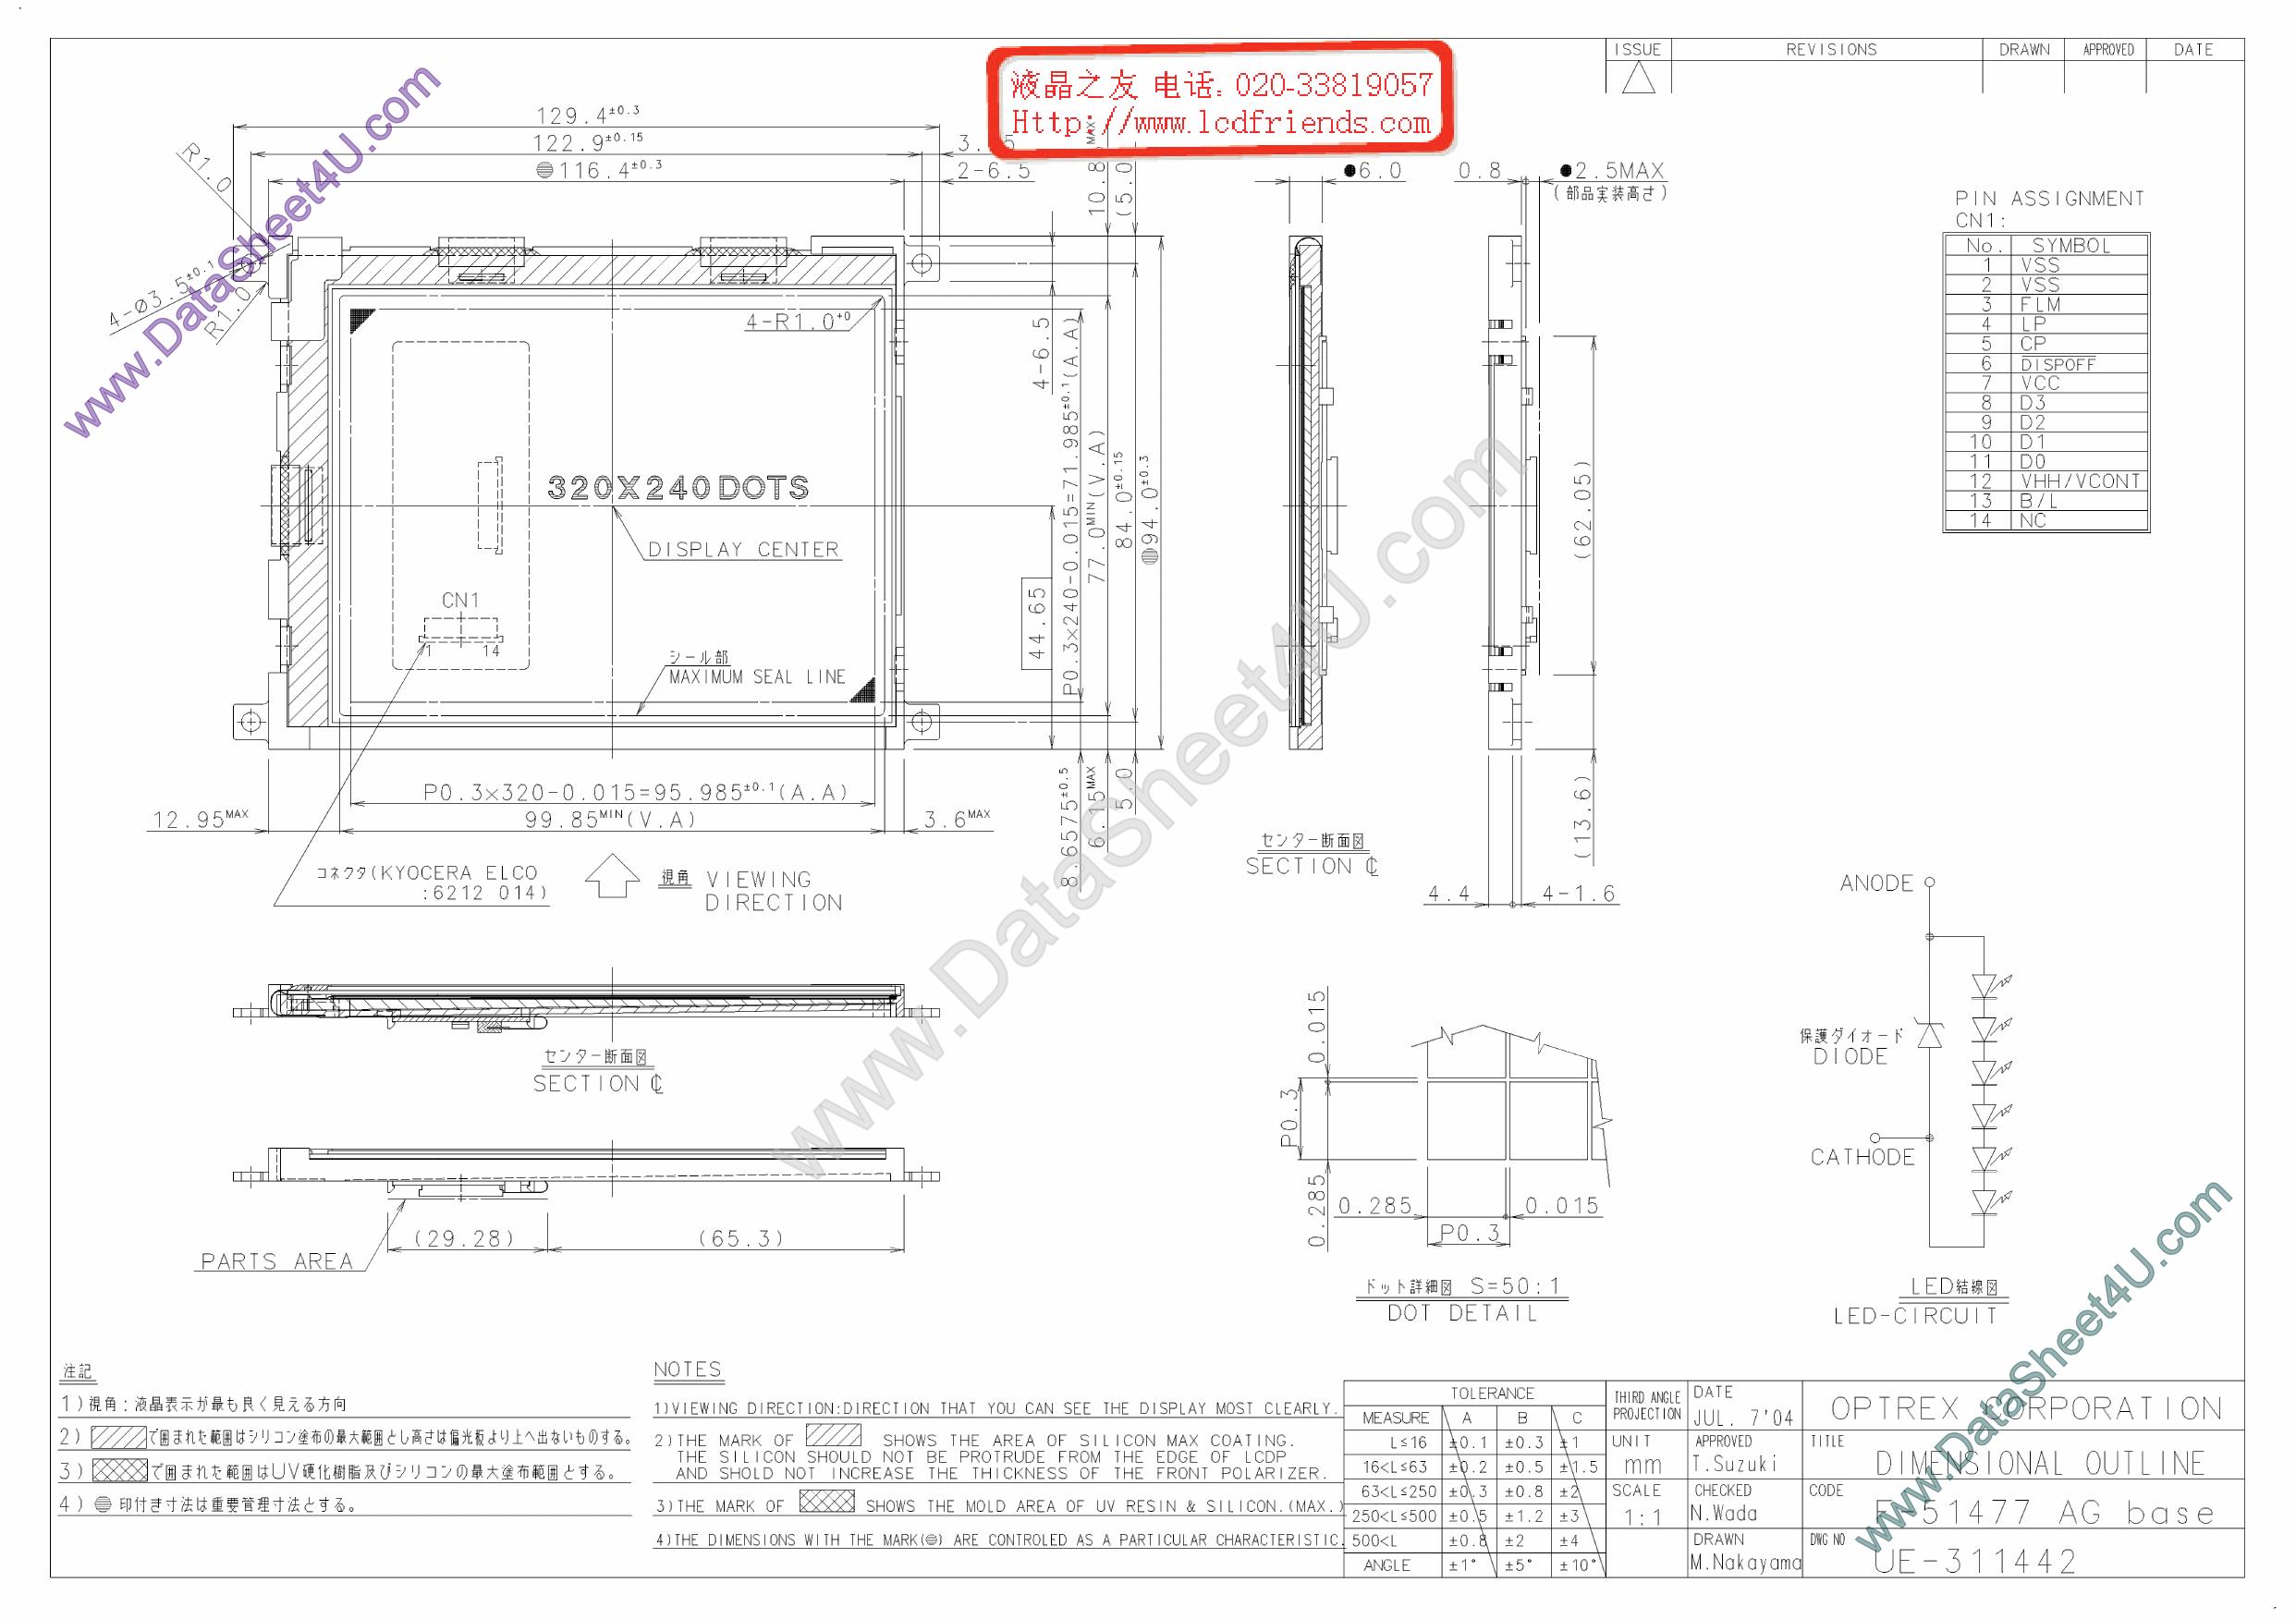 F-51477agd datasheet